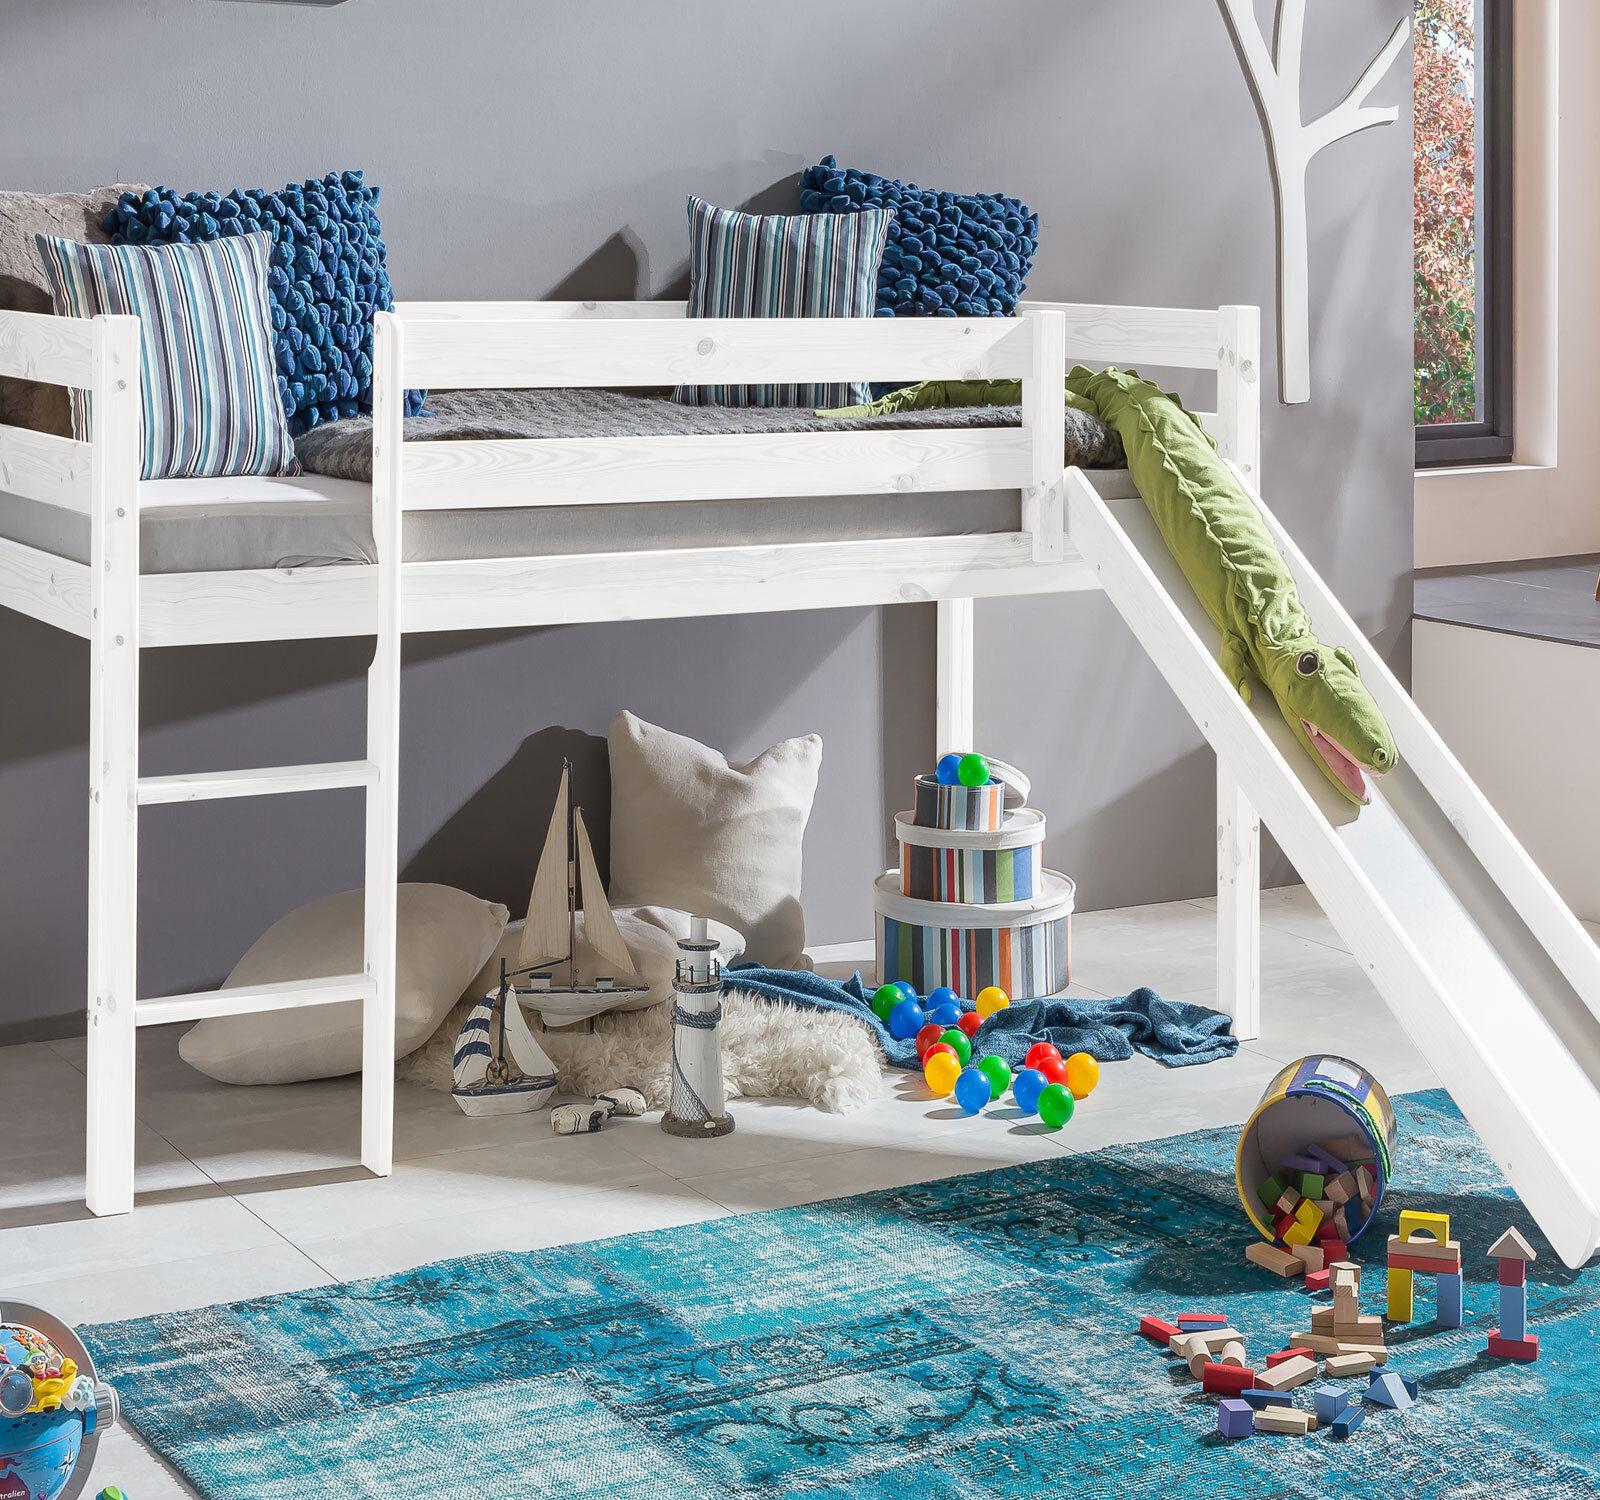 kinderbett hochbett mit rutsche leiter hochbett spielbett roll lattenrost weiss ebay. Black Bedroom Furniture Sets. Home Design Ideas